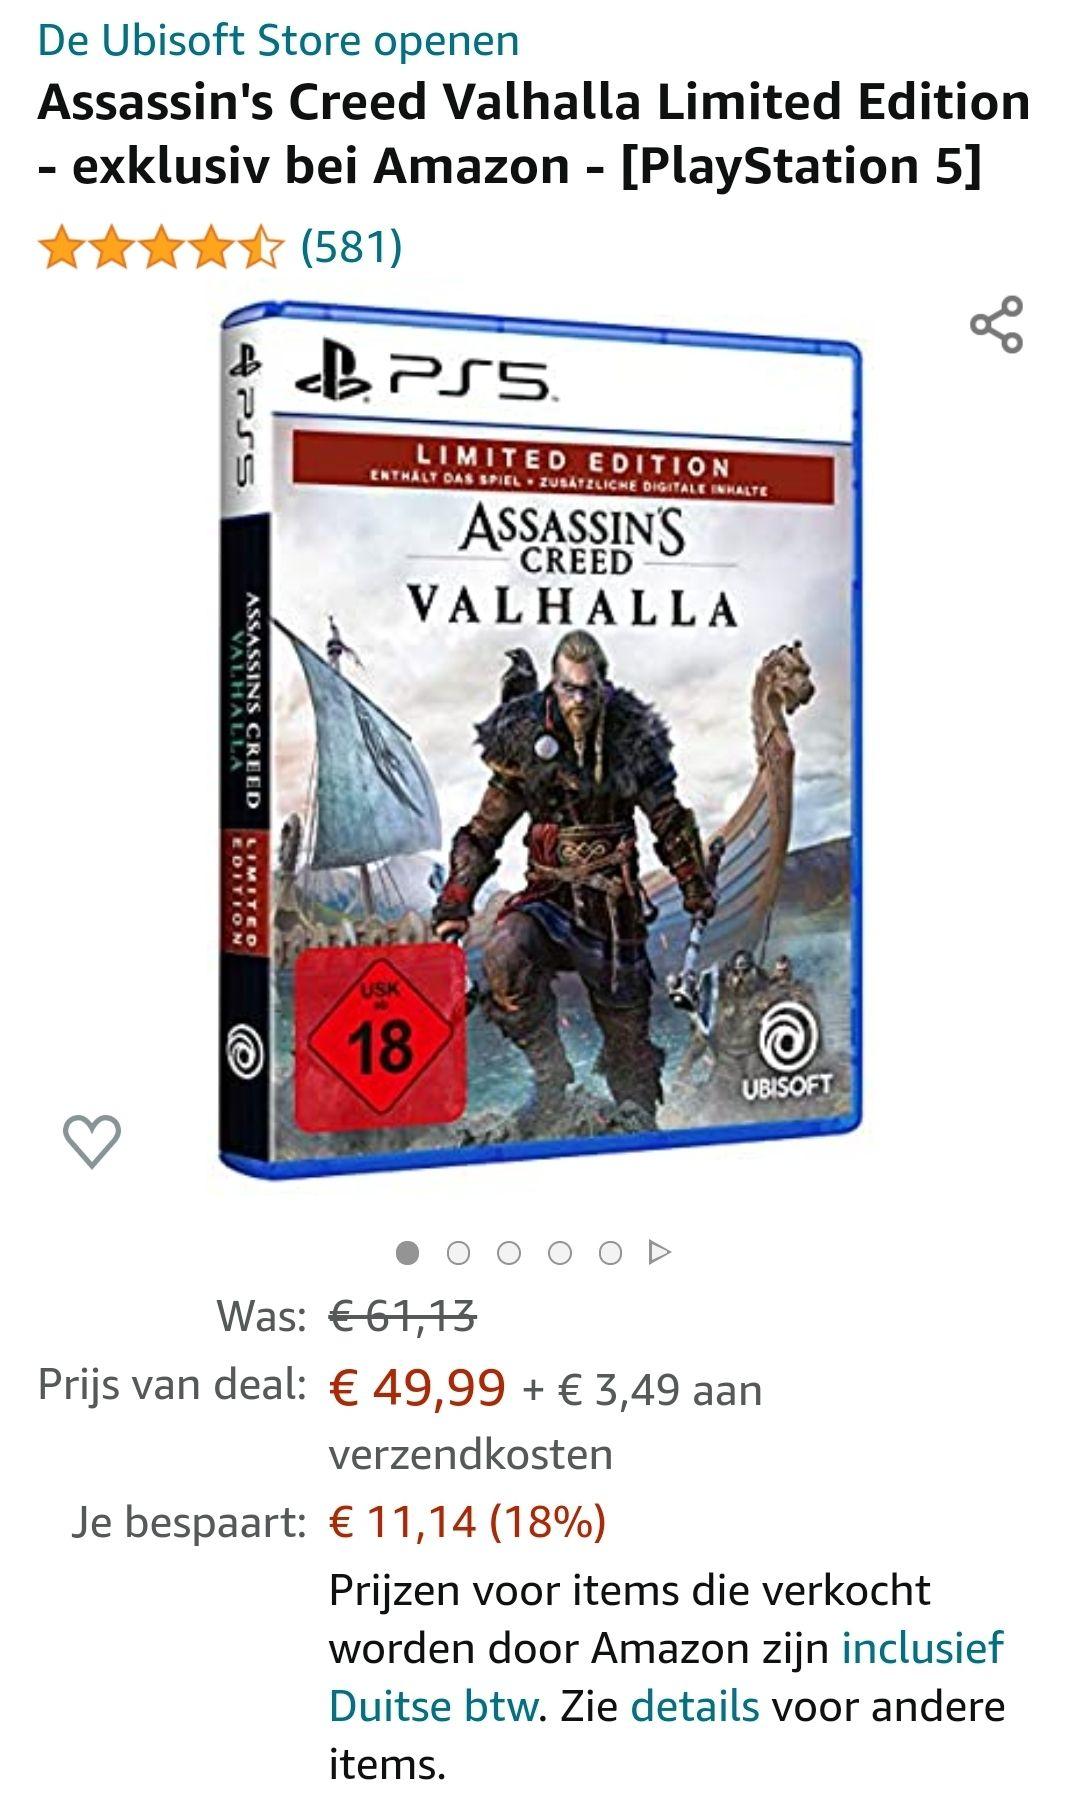 Assassin's Creed Valhalla Limited Edition - exclusief bij Amazon - [PlayStation 5]